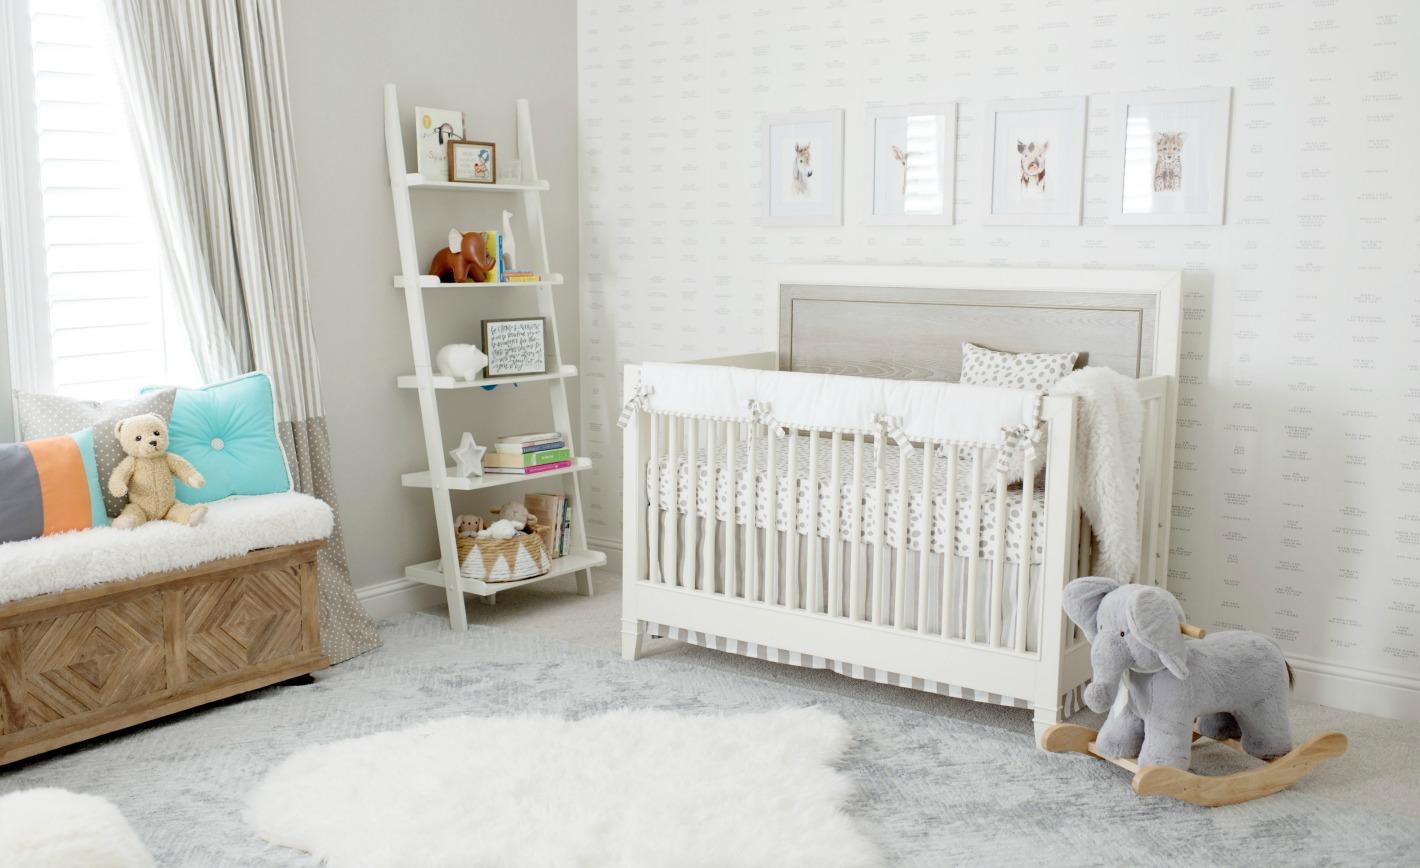 Nursery Design Trends Advice From Celebrity Designer: Celebrity Design Reveal: Catherine And Sean Lowe's Nursery